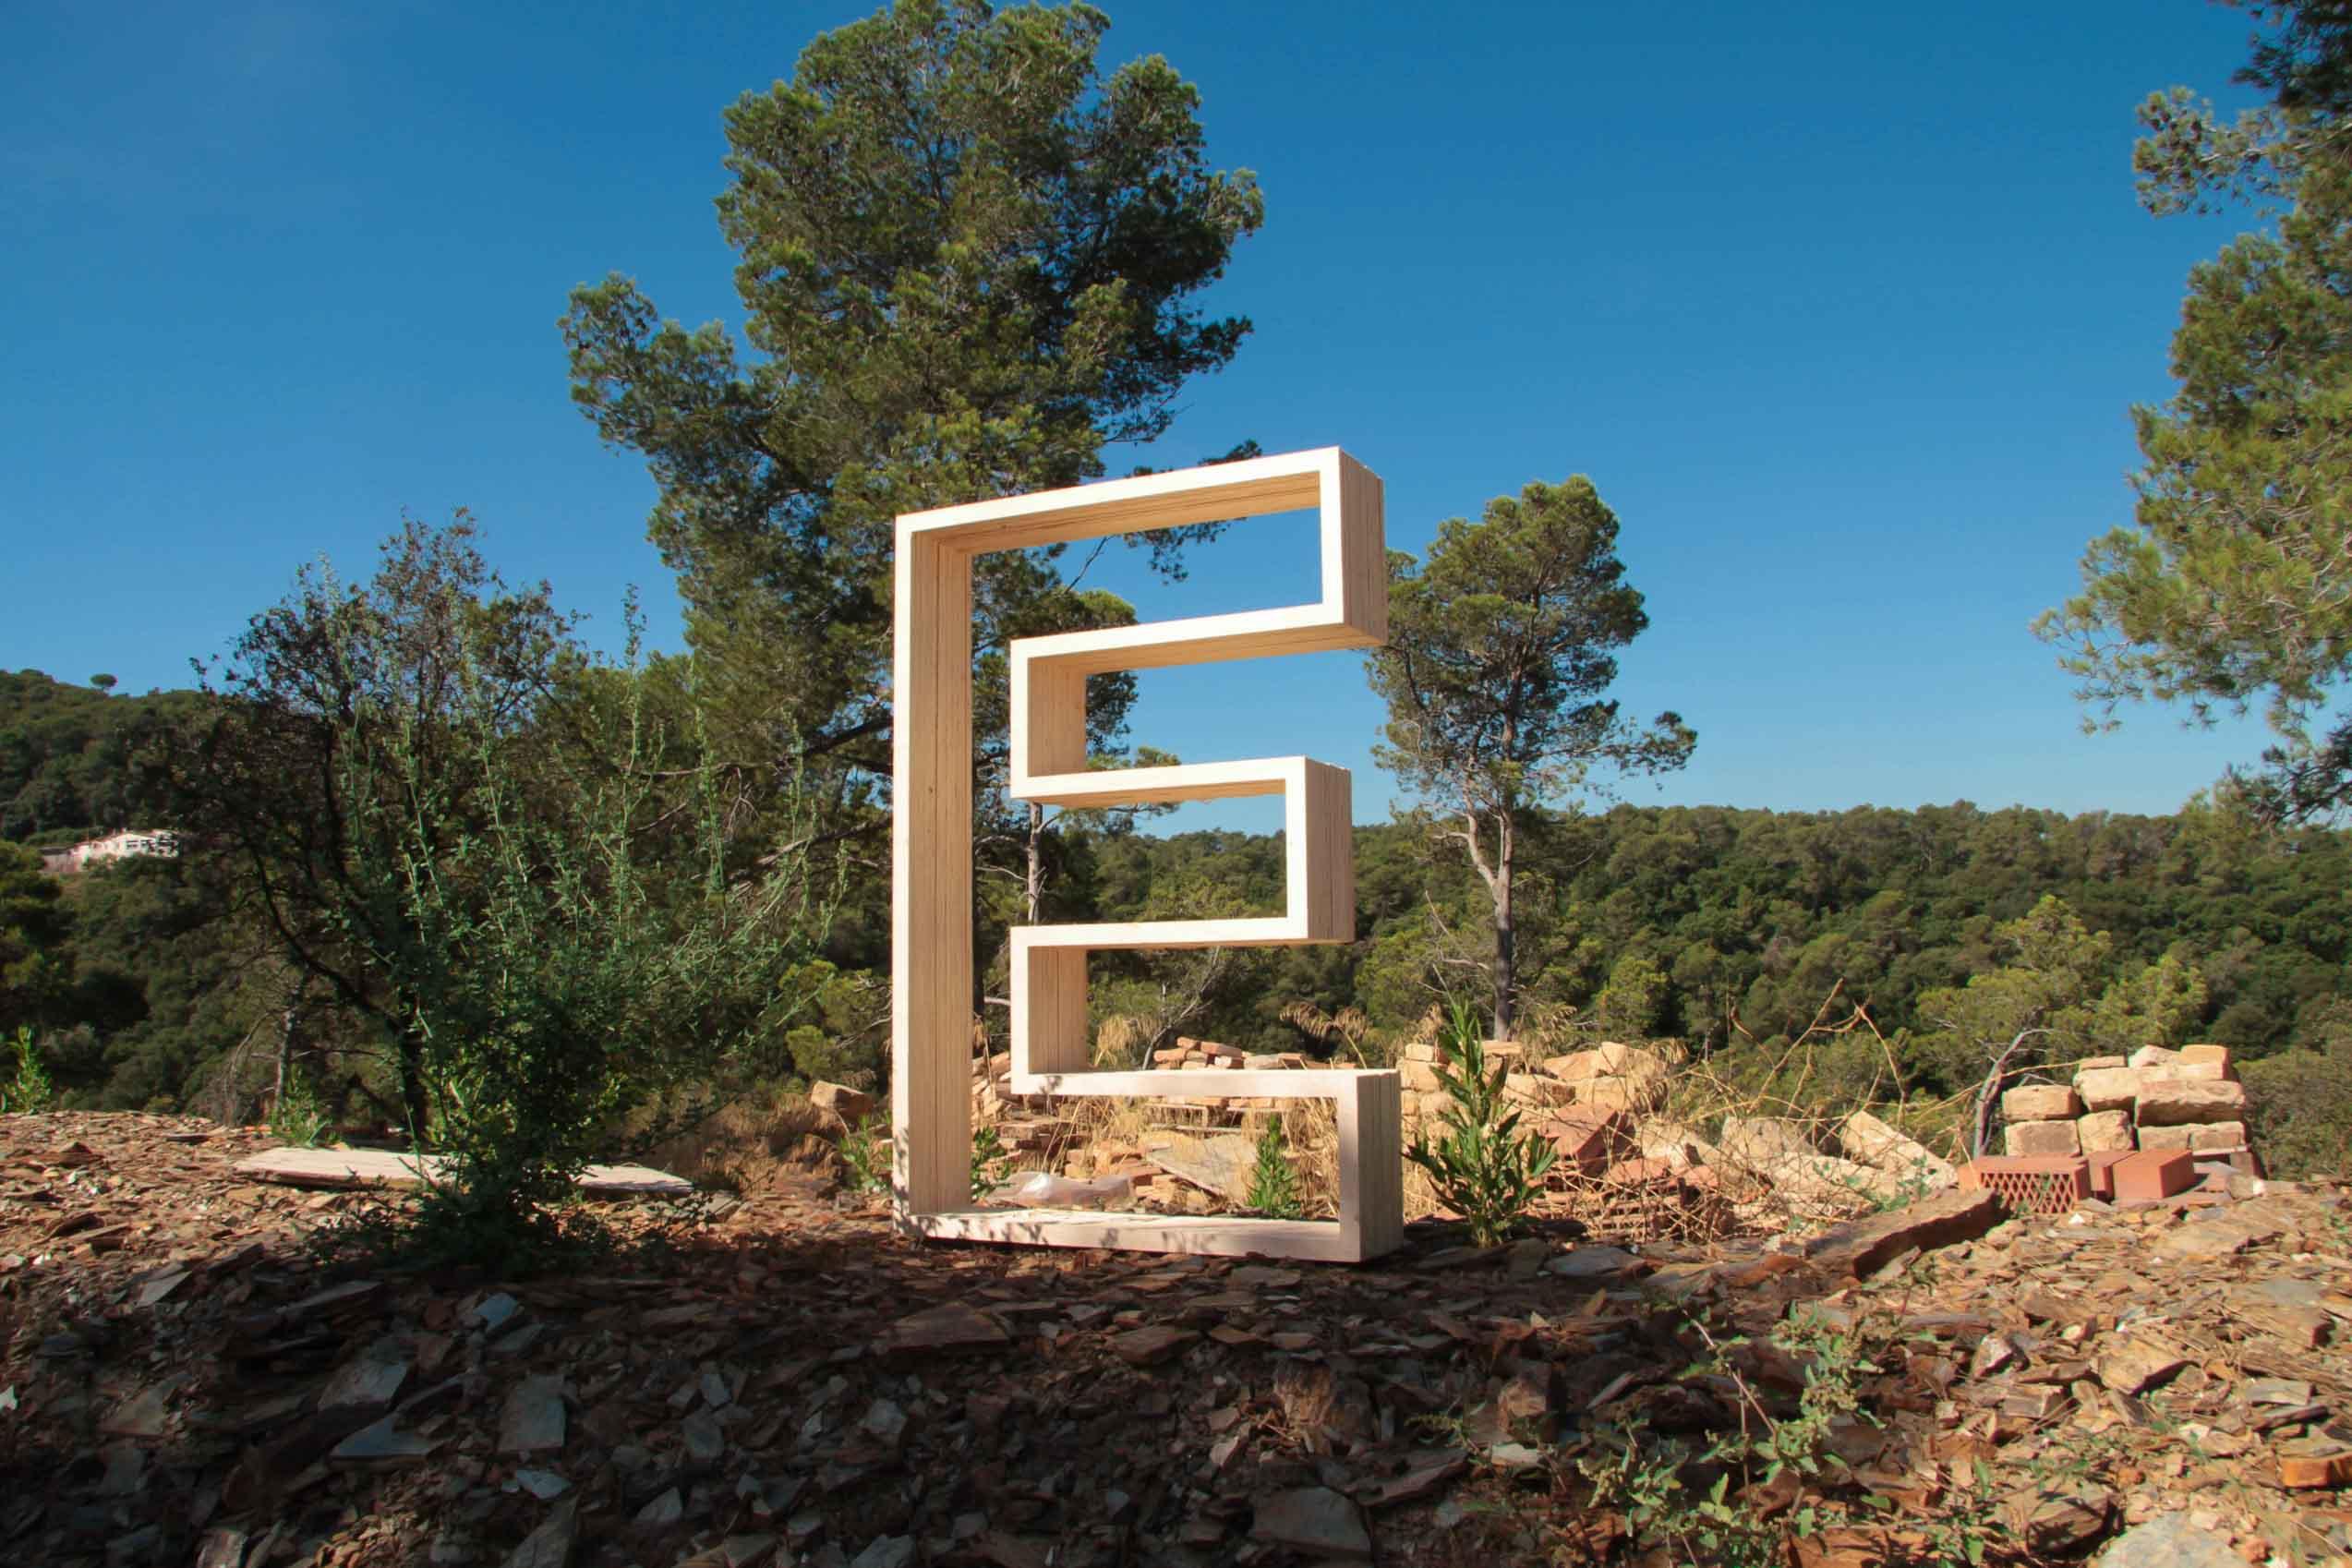 the valldaura experience-ms-balloon-iaac-lo-siento-design-hand-made-wood-work-barcelona_-9